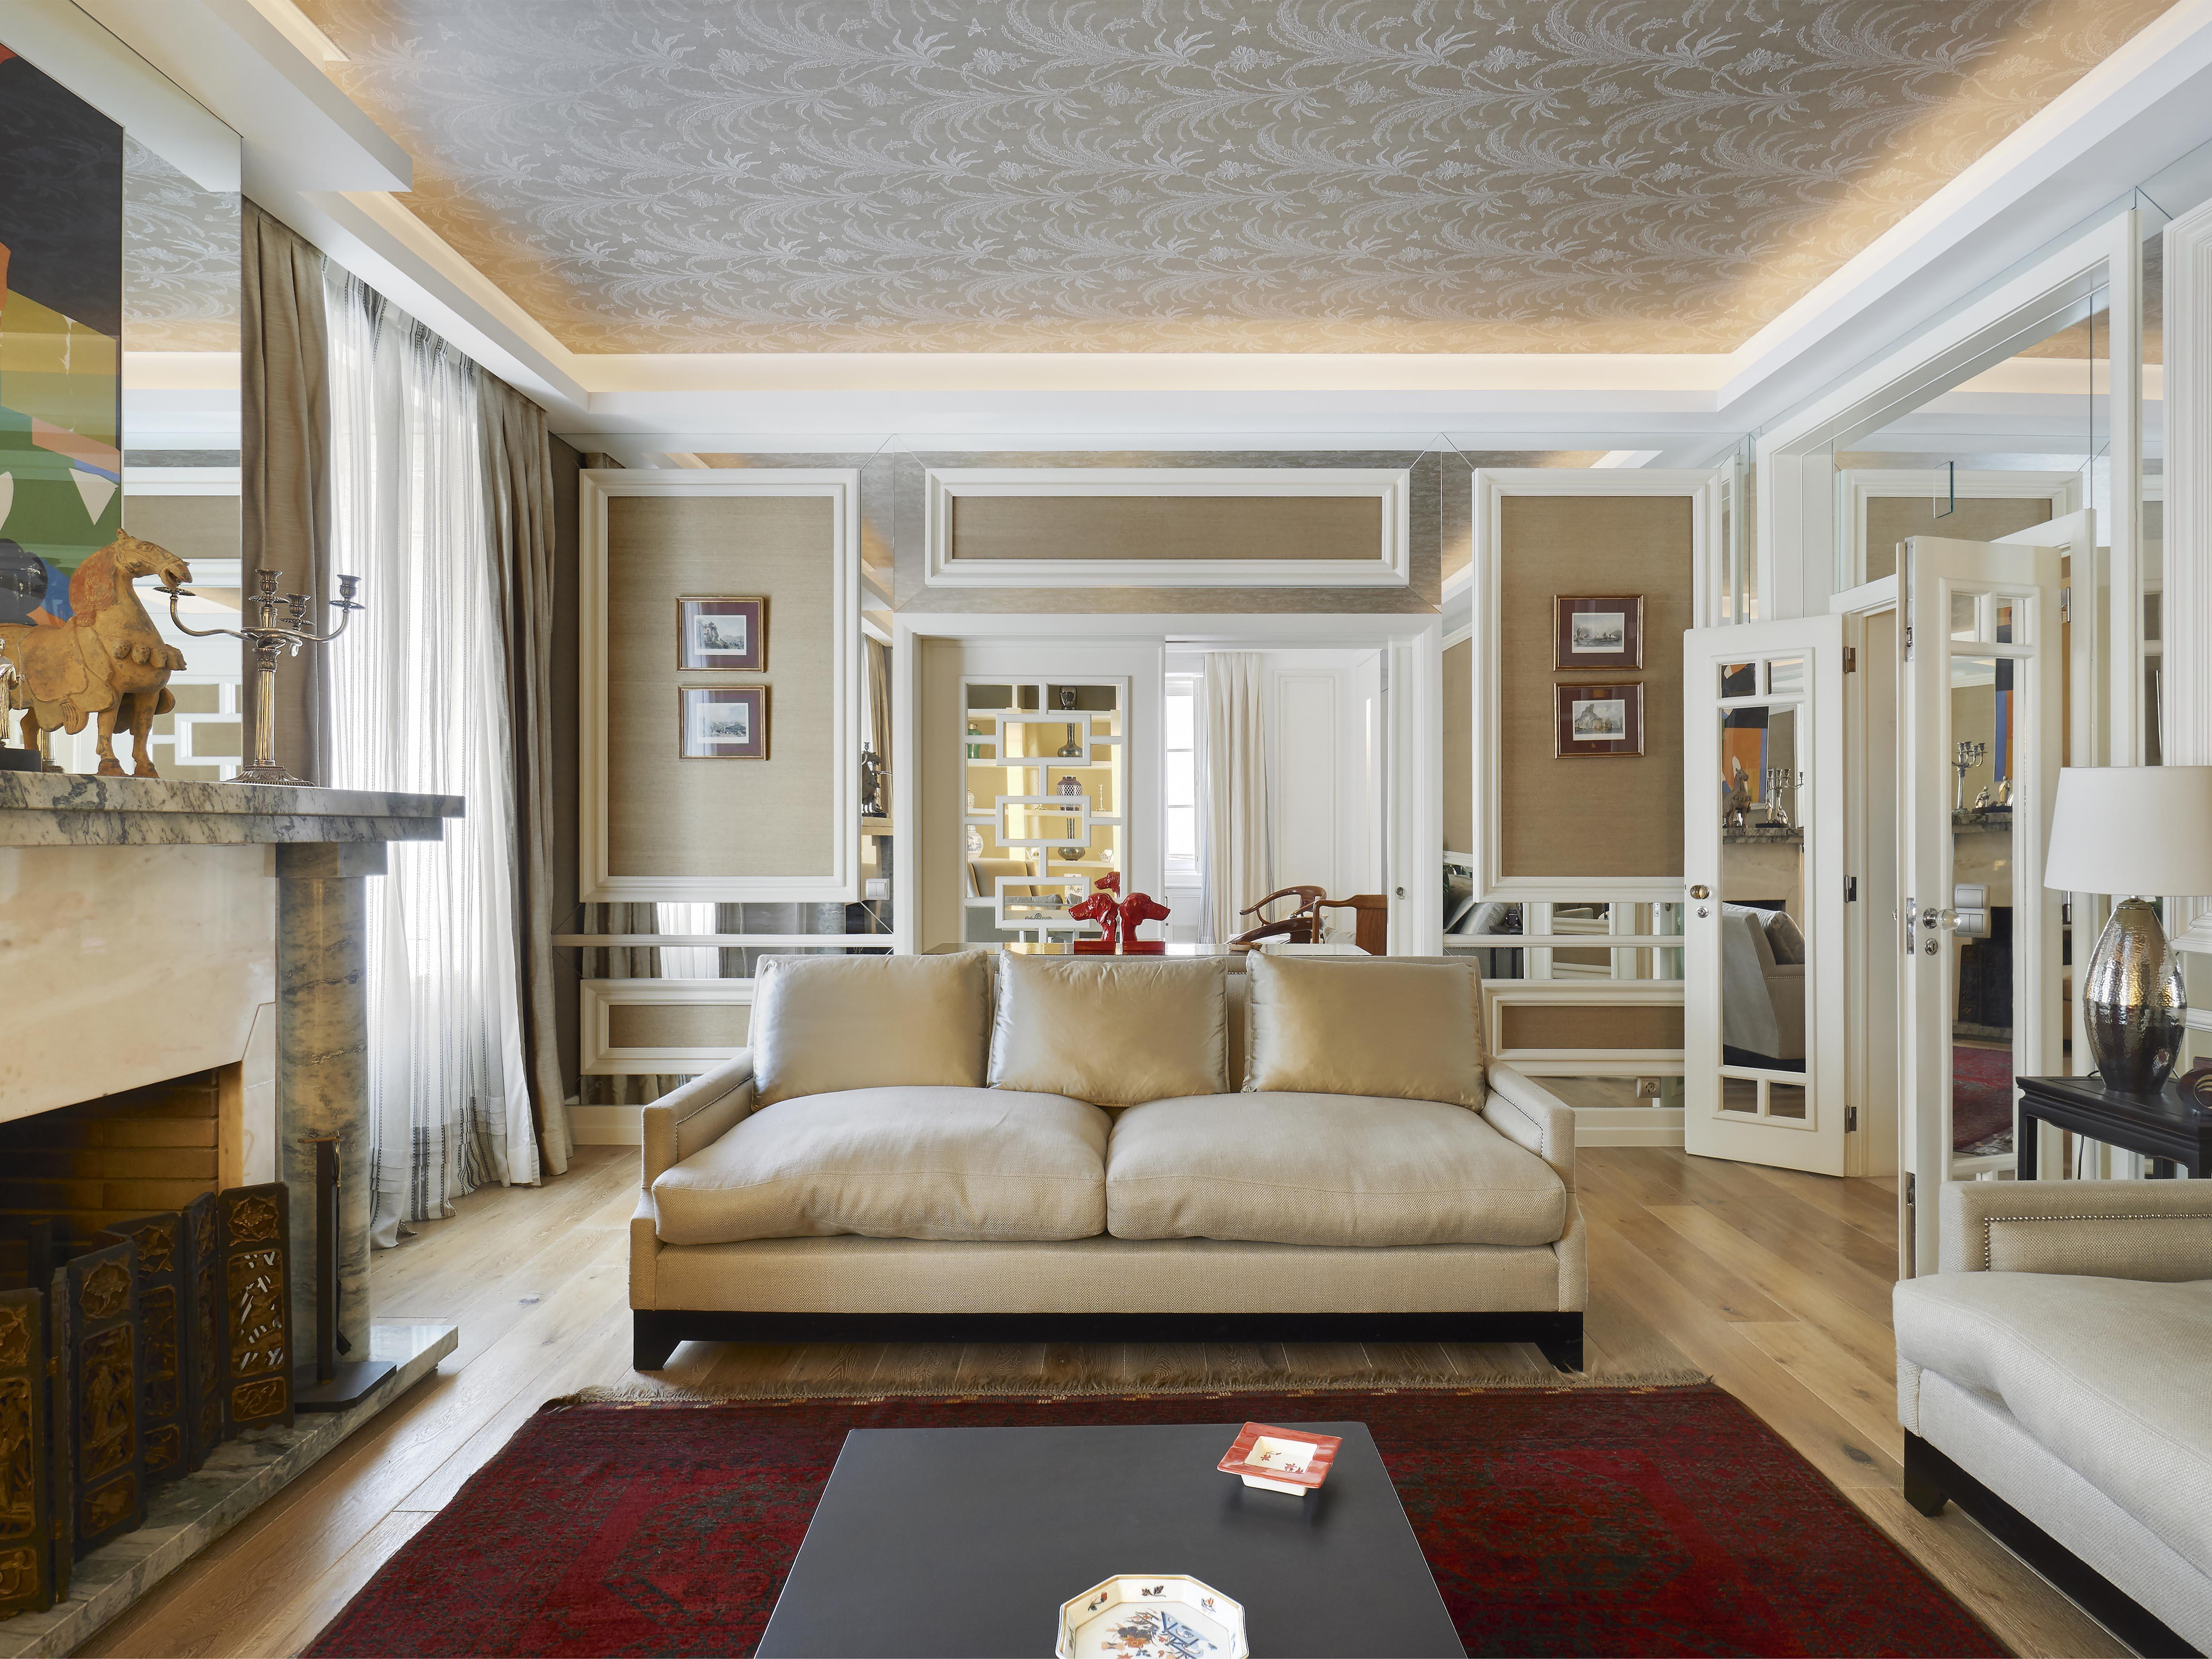 公寓 為 出售 在 Flat, 4 bedrooms, for Sale Lisboa, 葡京, 葡萄牙